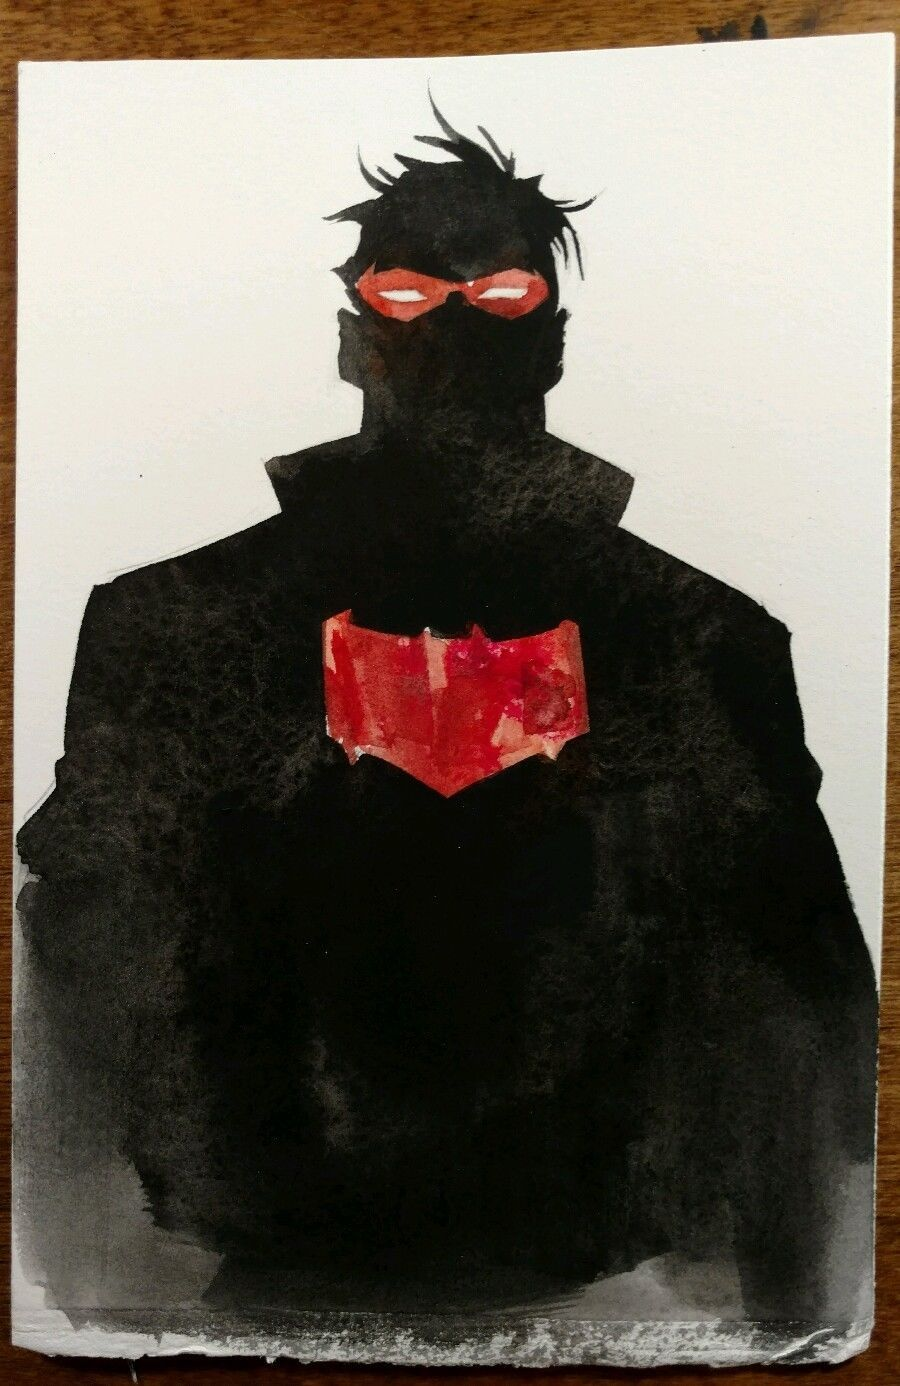 Dustin Nguyen (Batman) Original Red Hood art +free 2016 80pg artbook NO RESERVE Comic Art Auction